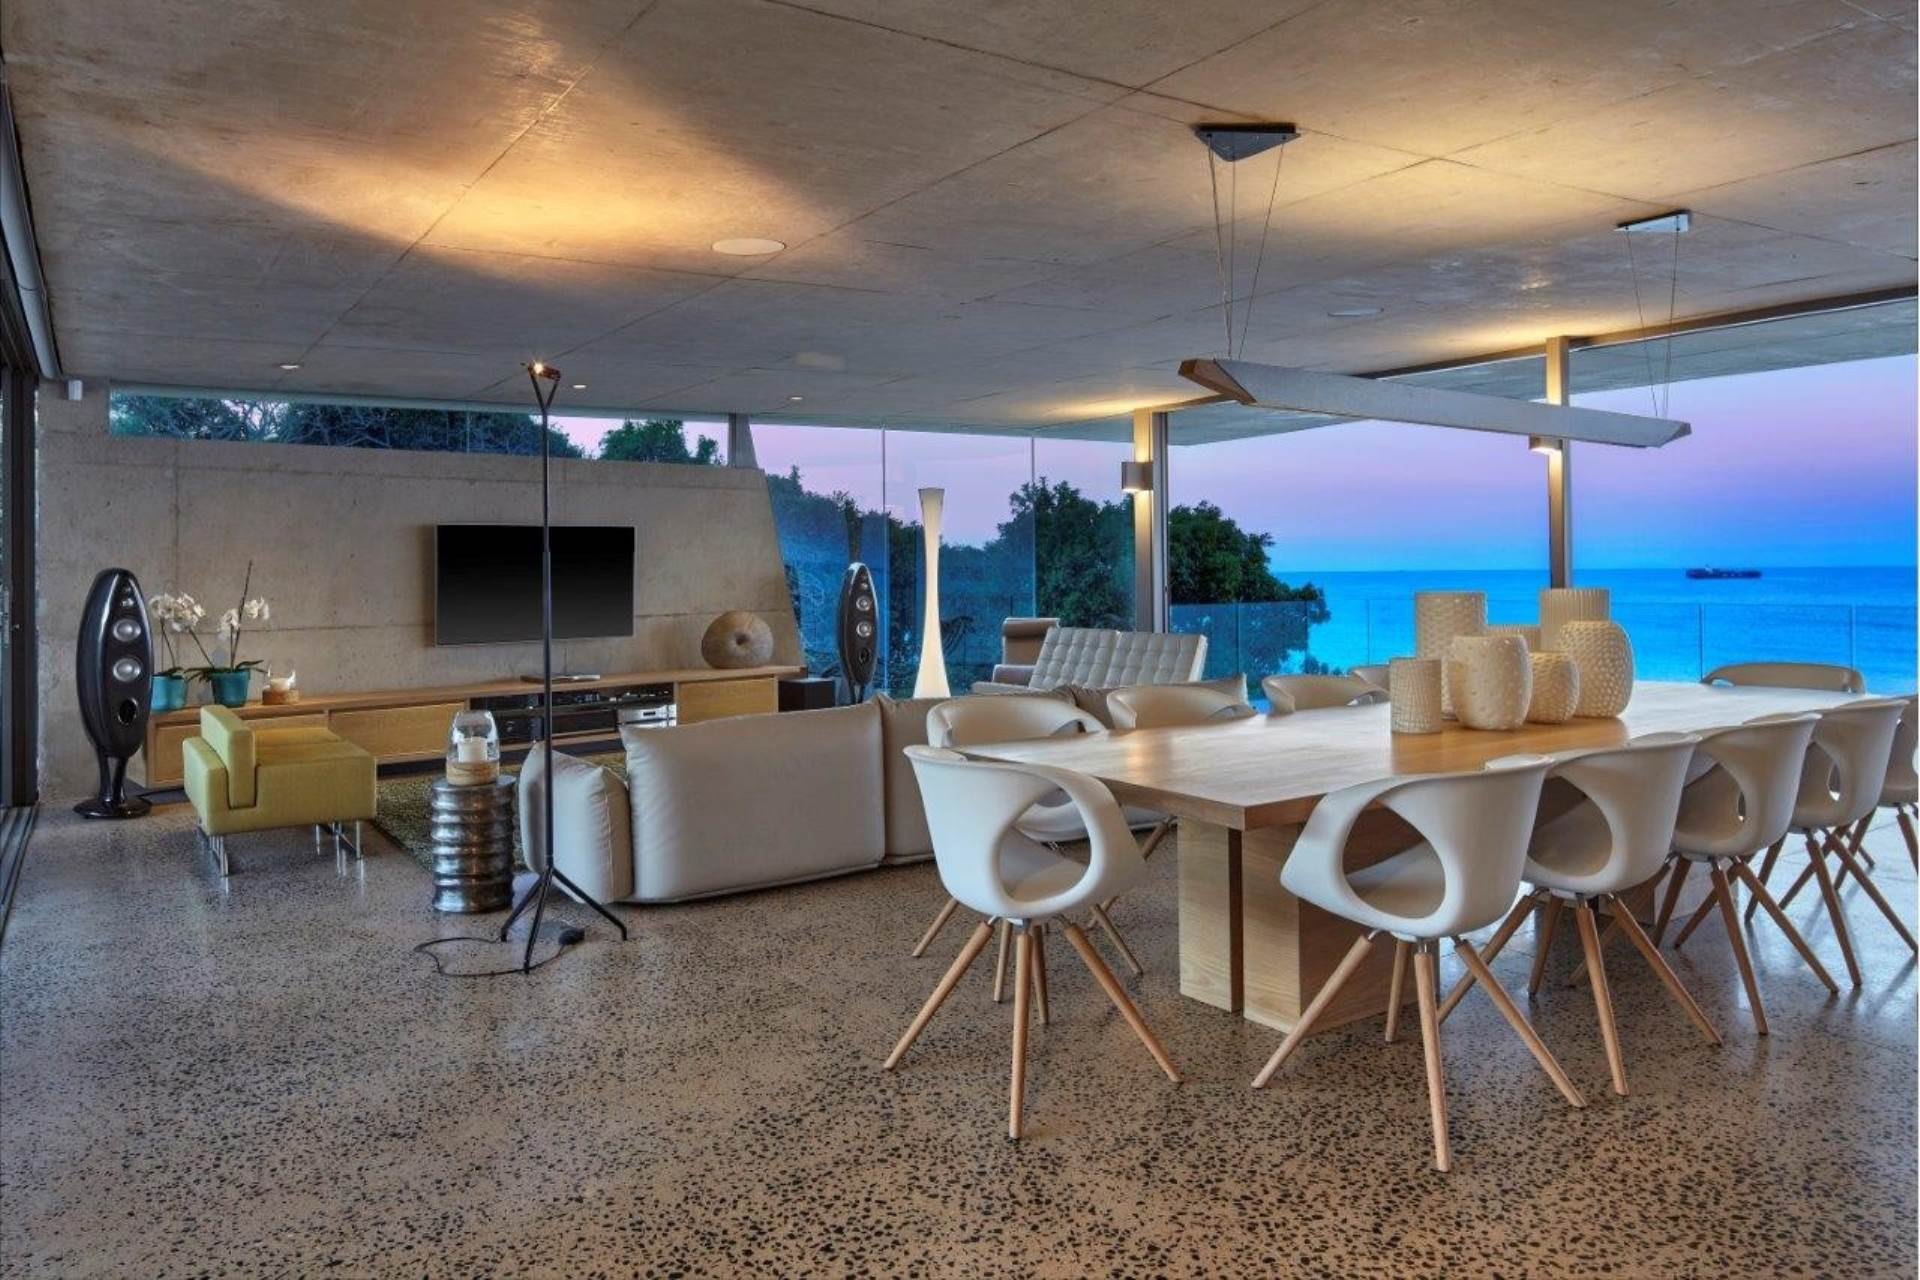 Umdloti, Umdloti Beach Property  | Houses For Sale Umdloti Beach, UMDLOTI BEACH, Townhouse 4 bedrooms property for sale Price:11,900,000